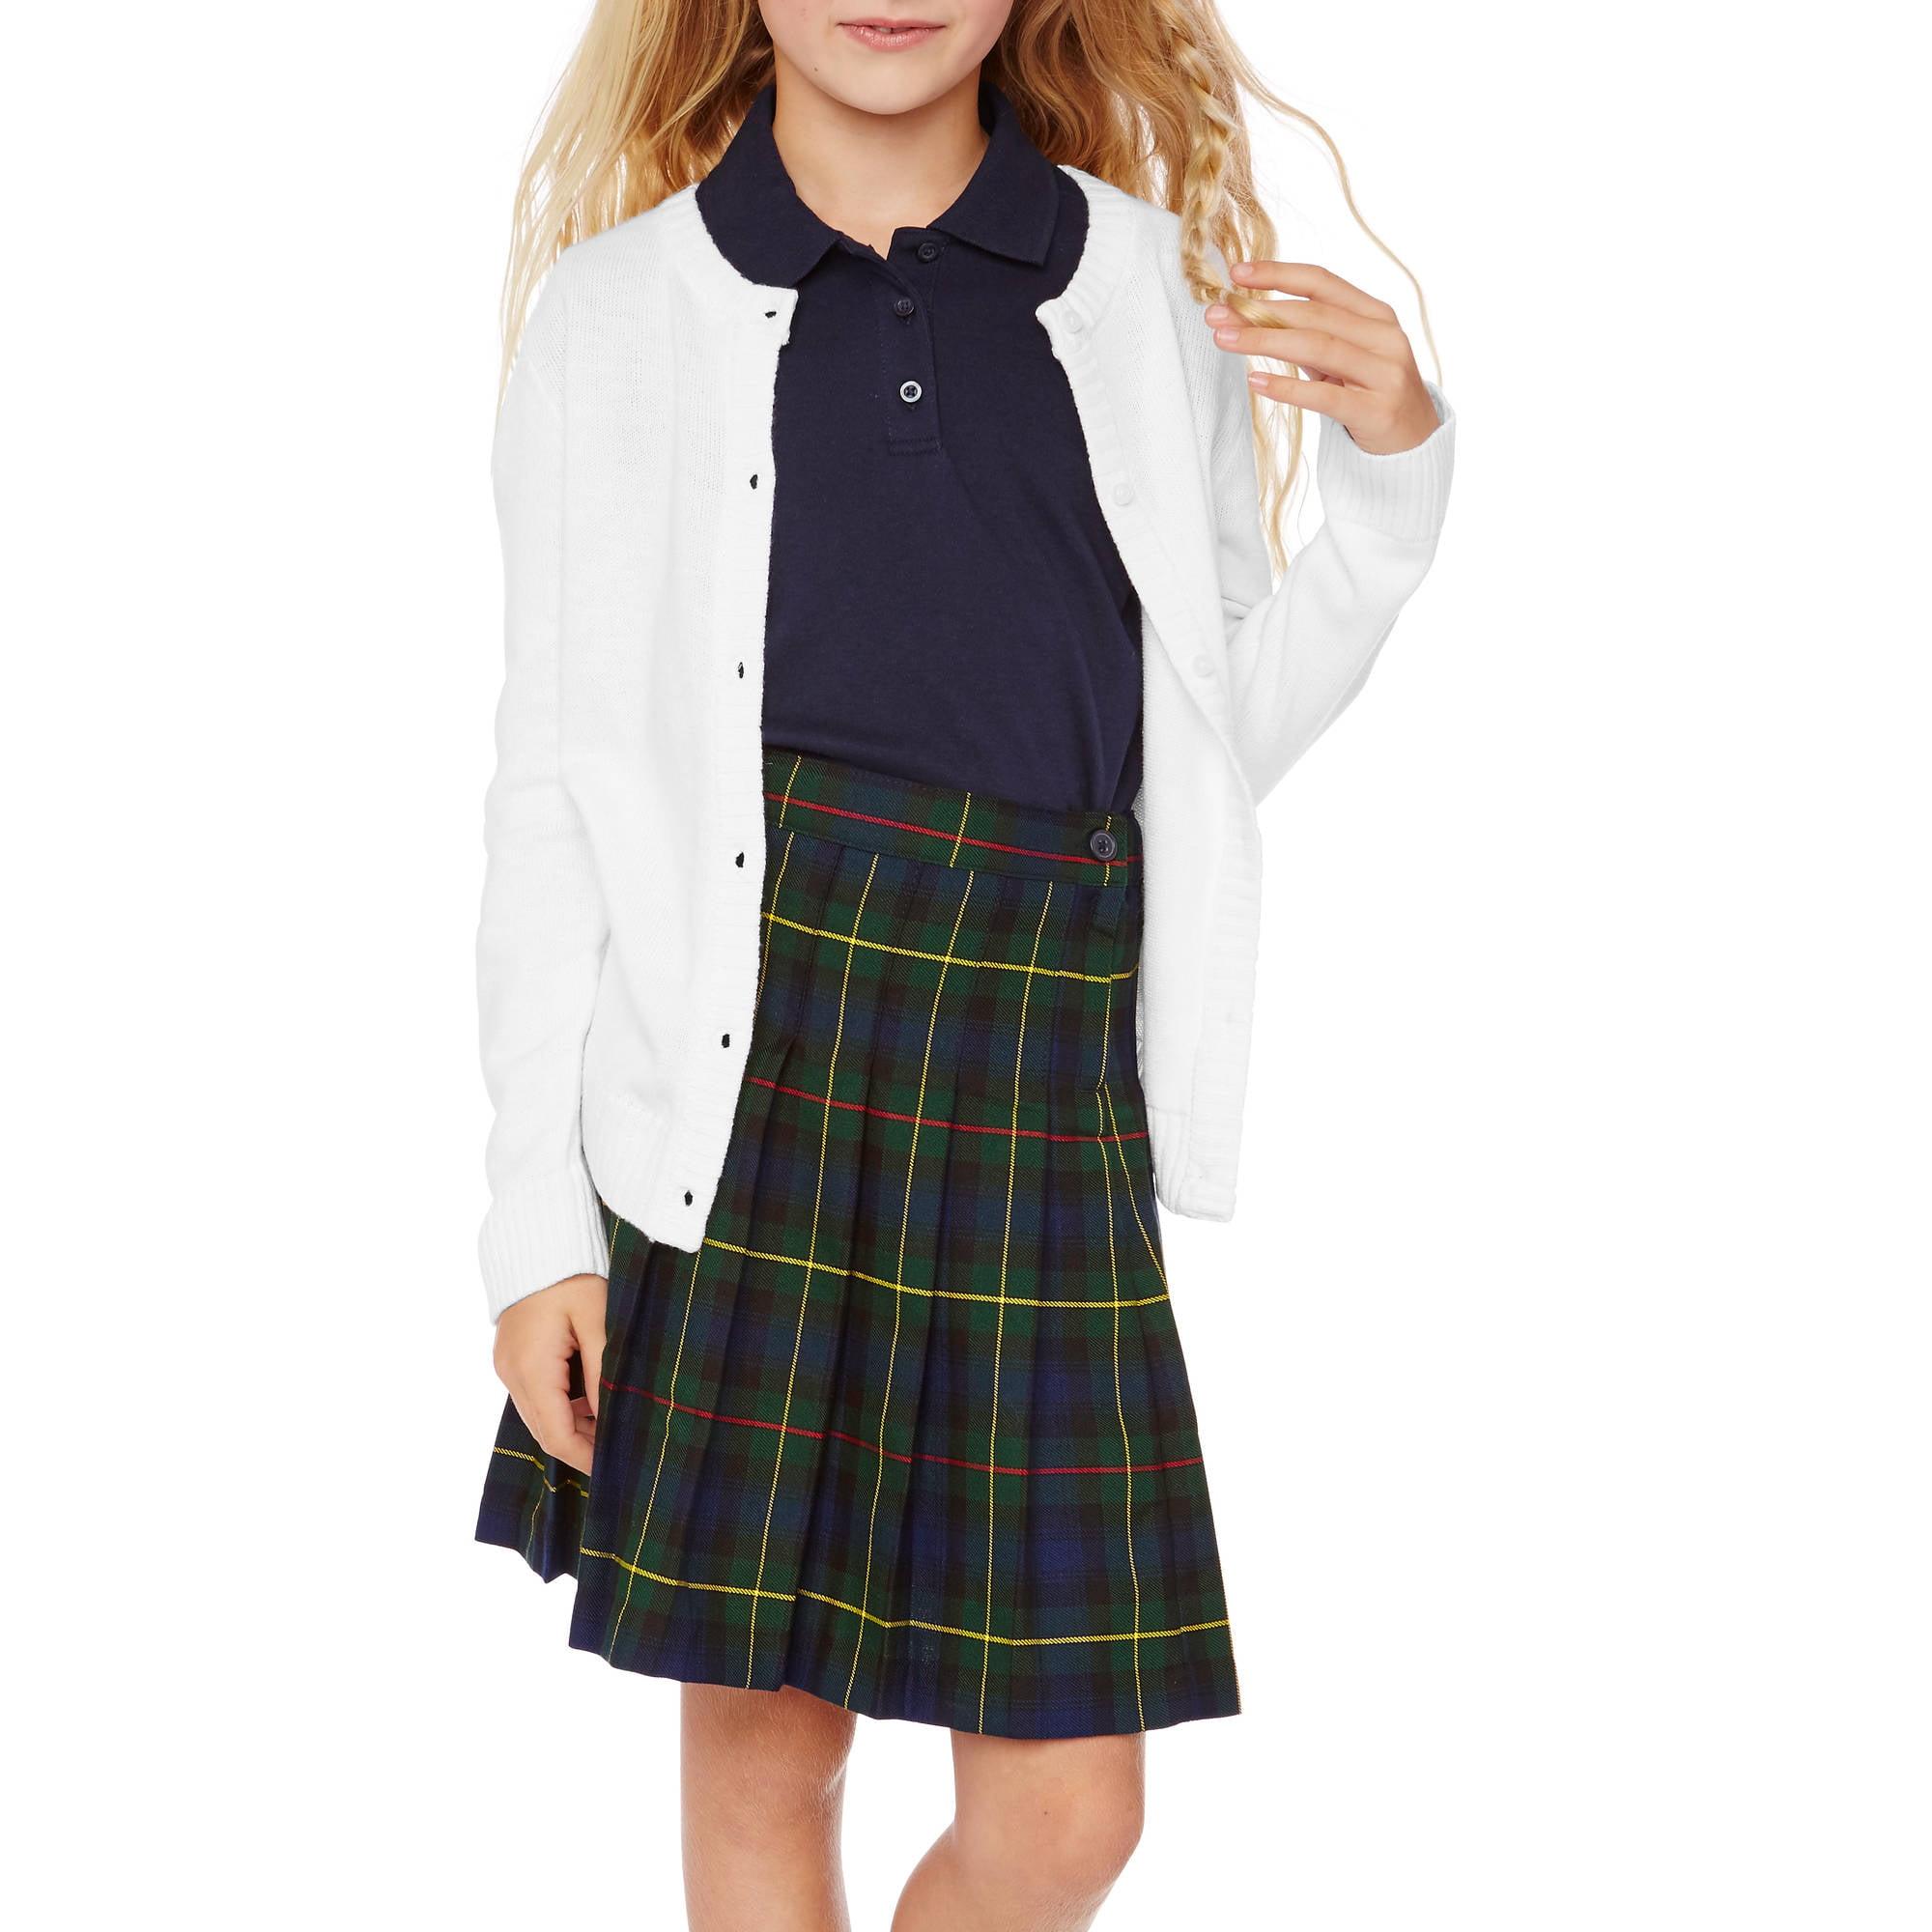 George Girls' School Uniforms Cardigan Sweater